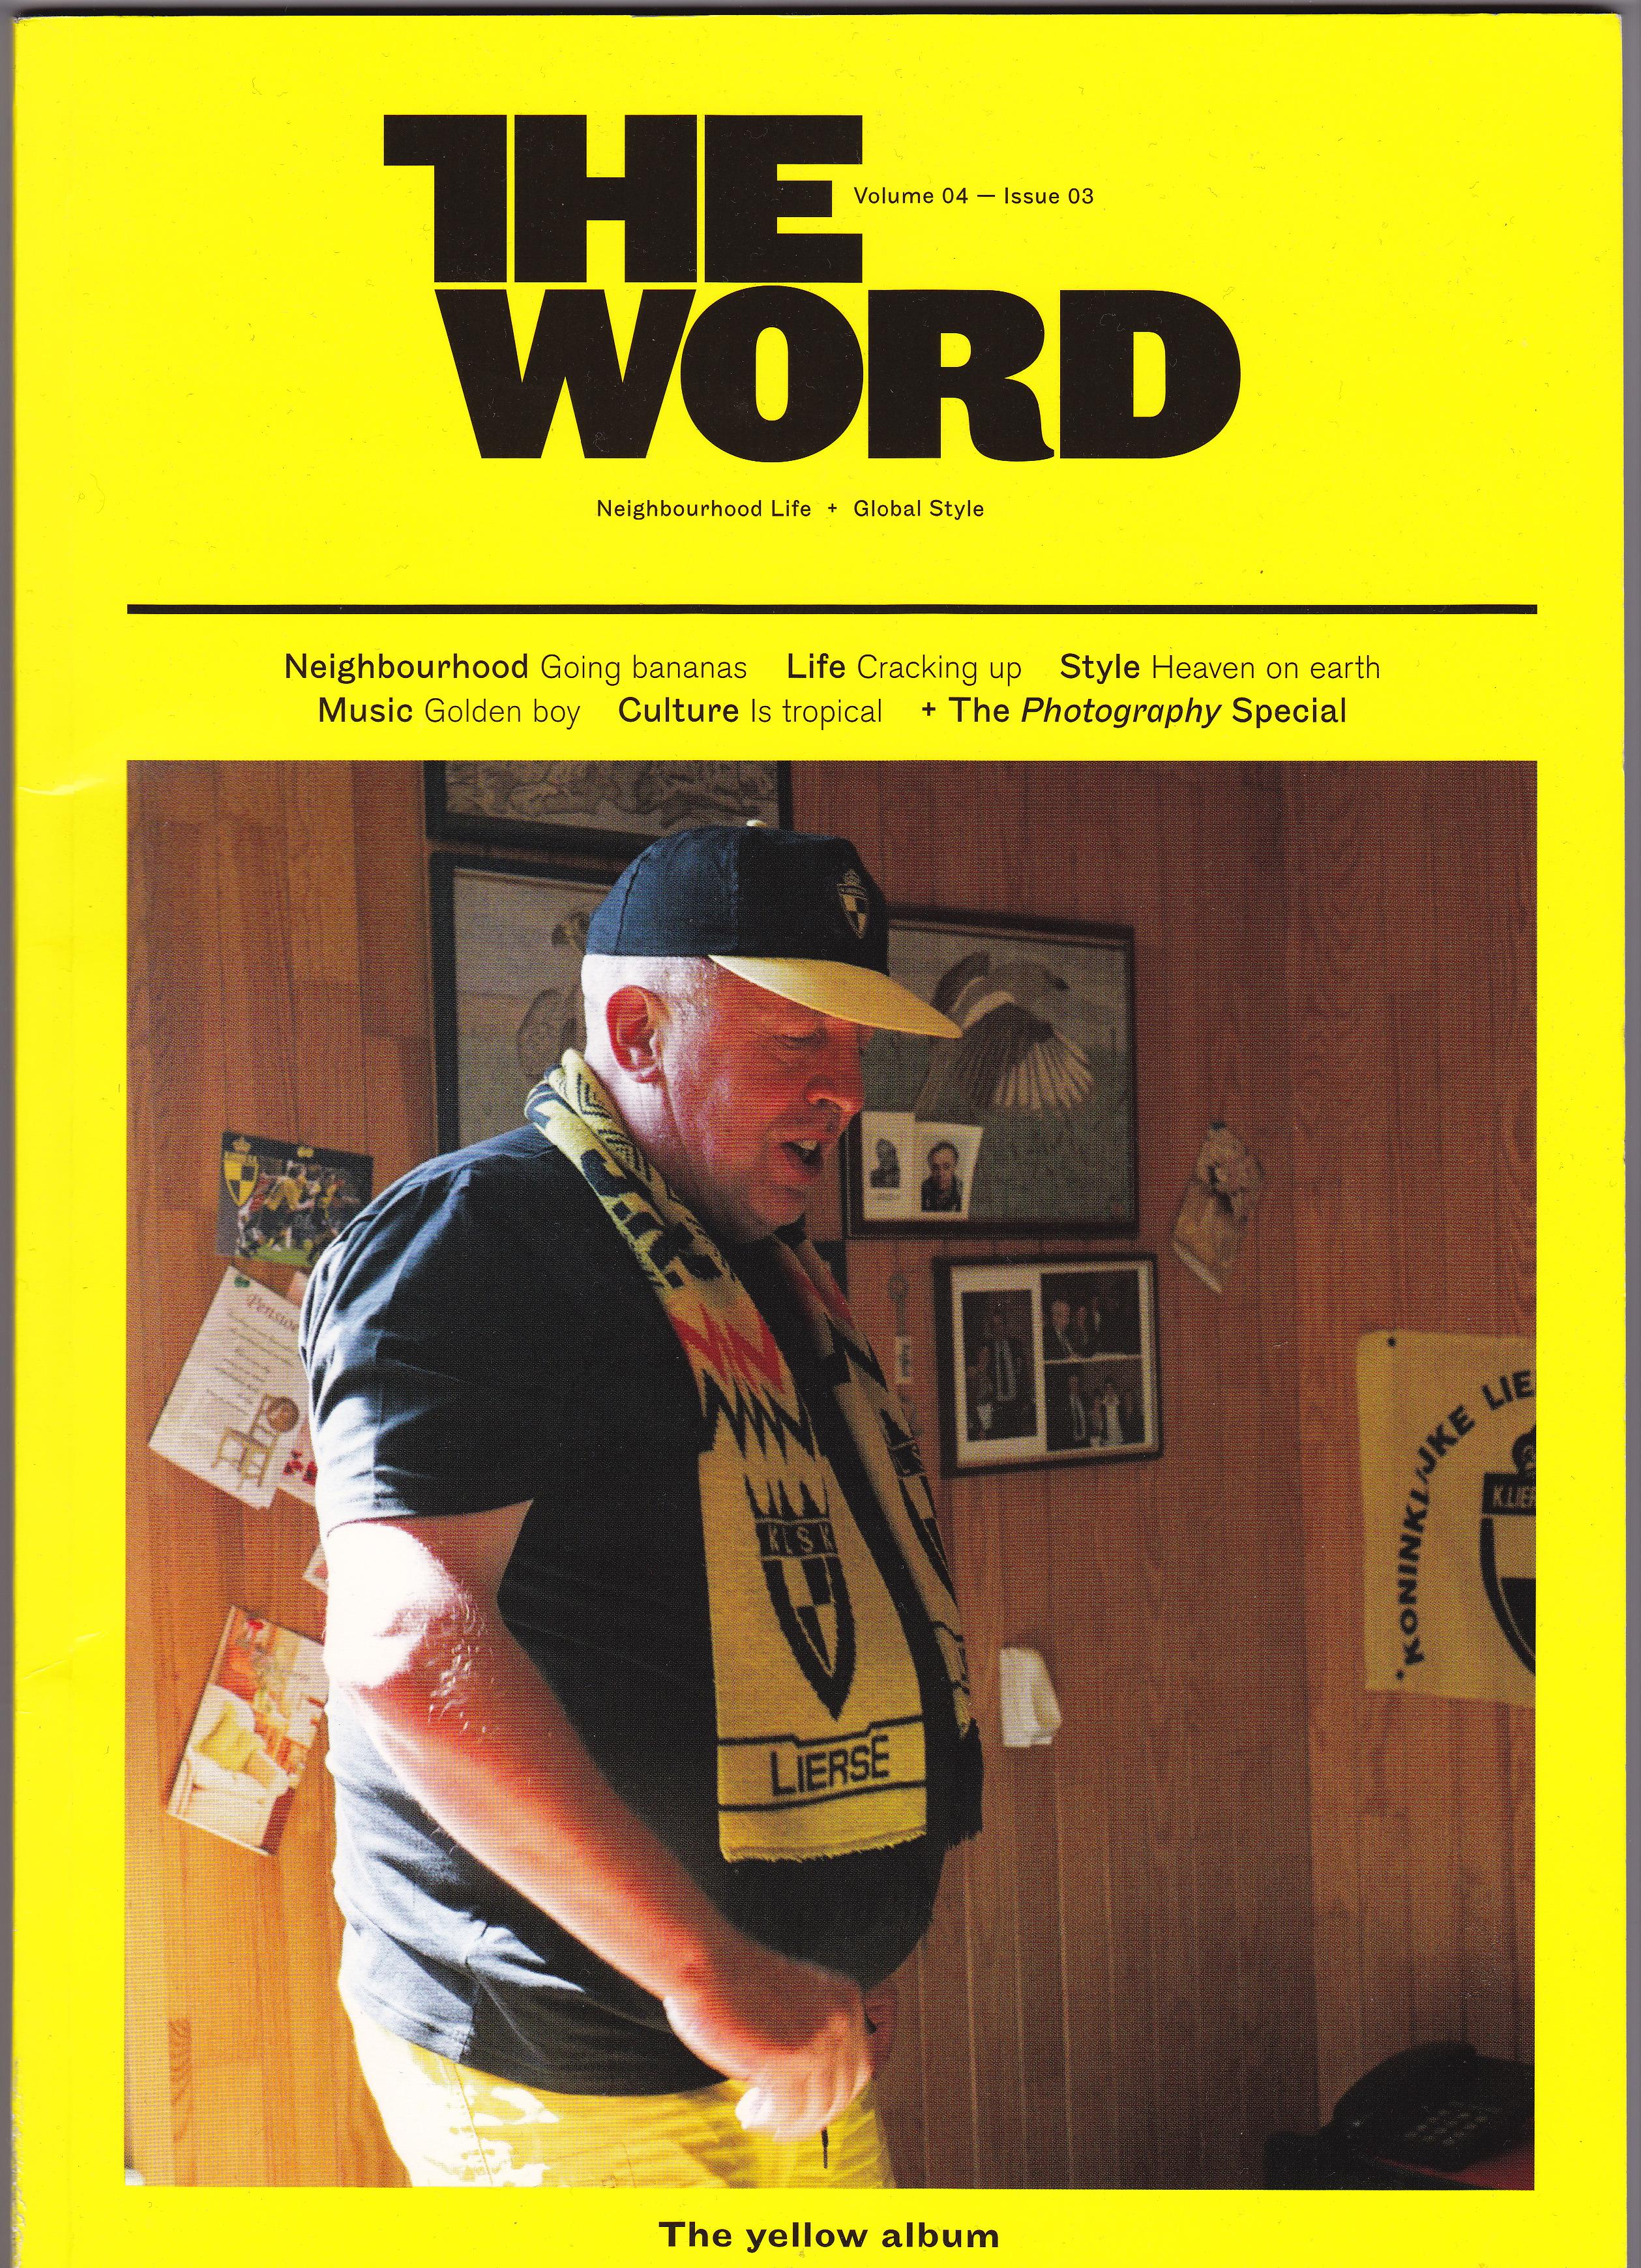 [PRESS] THE WORD MAGAZINE x A POLAROID STORY